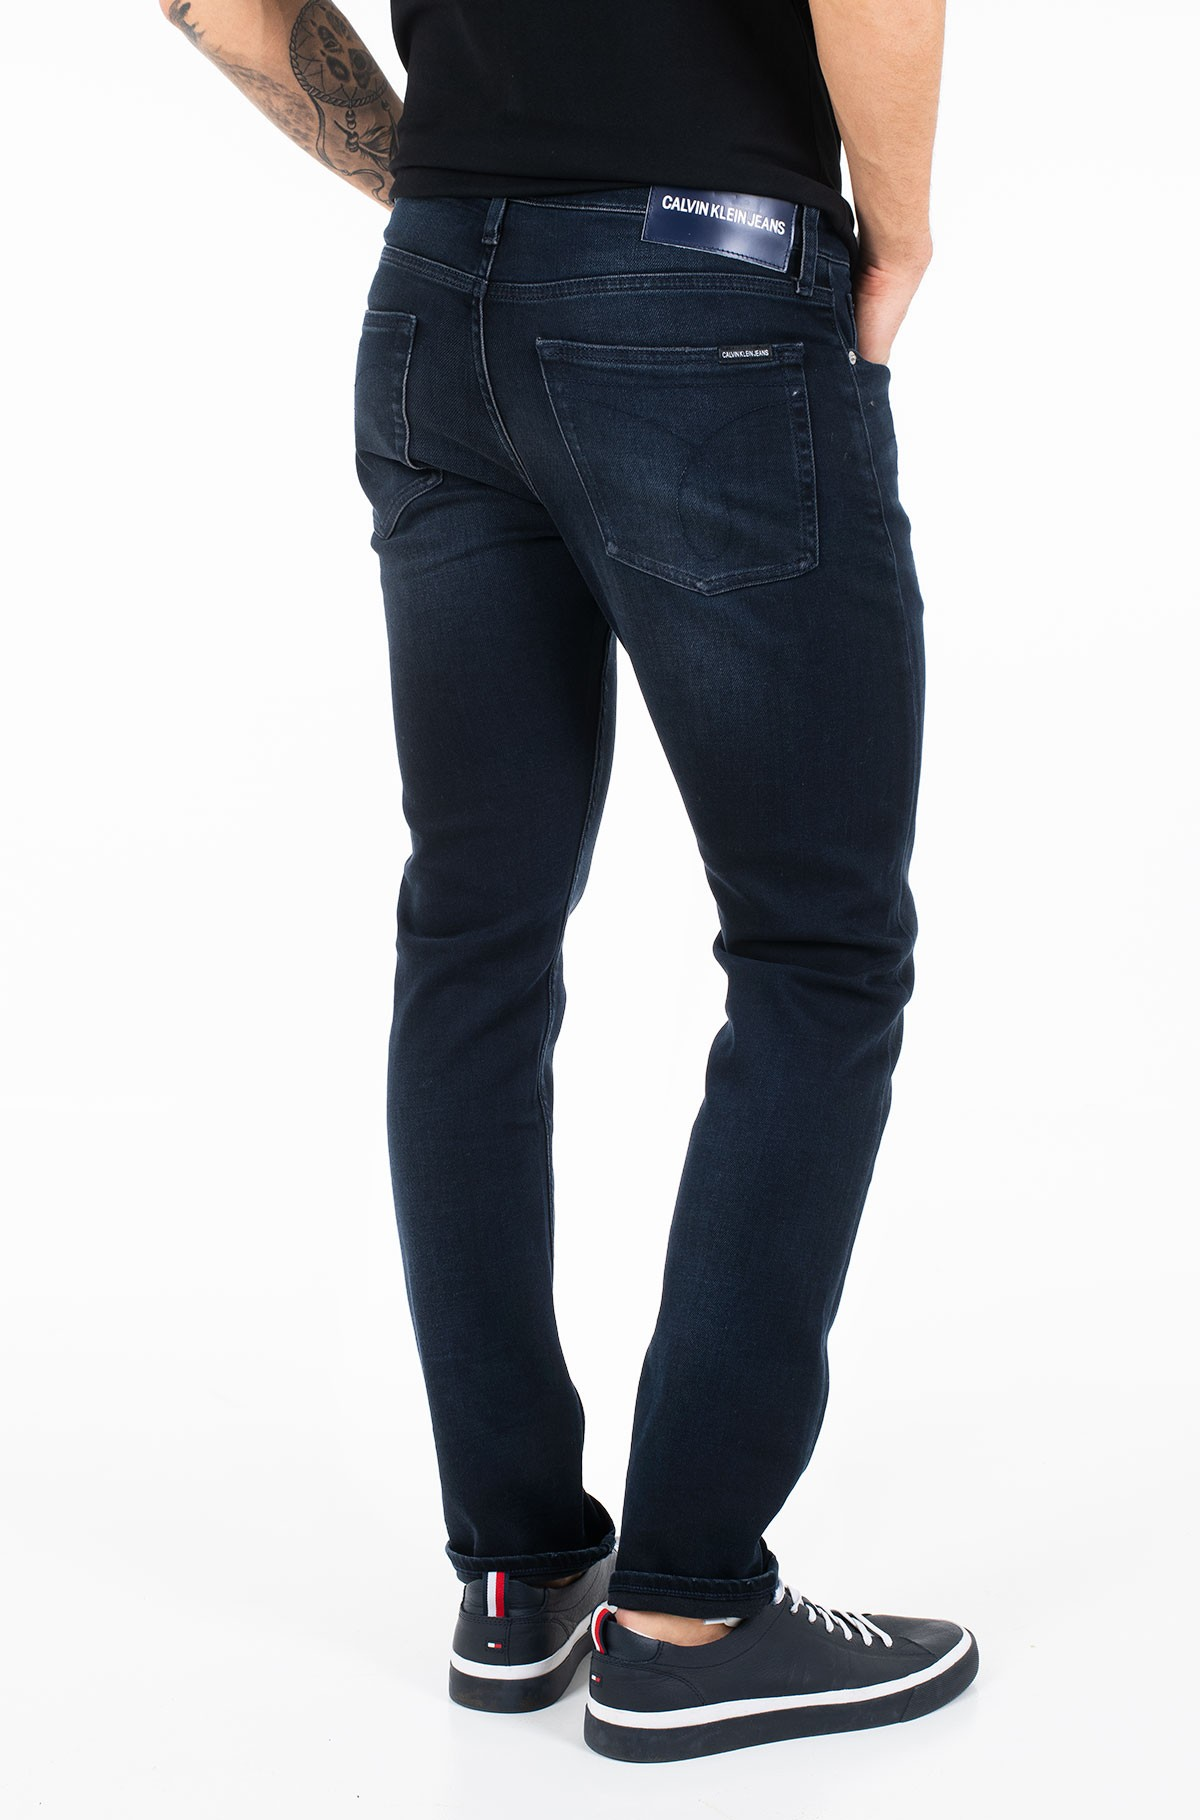 Jeans CKJ 026 SLIM-full-2